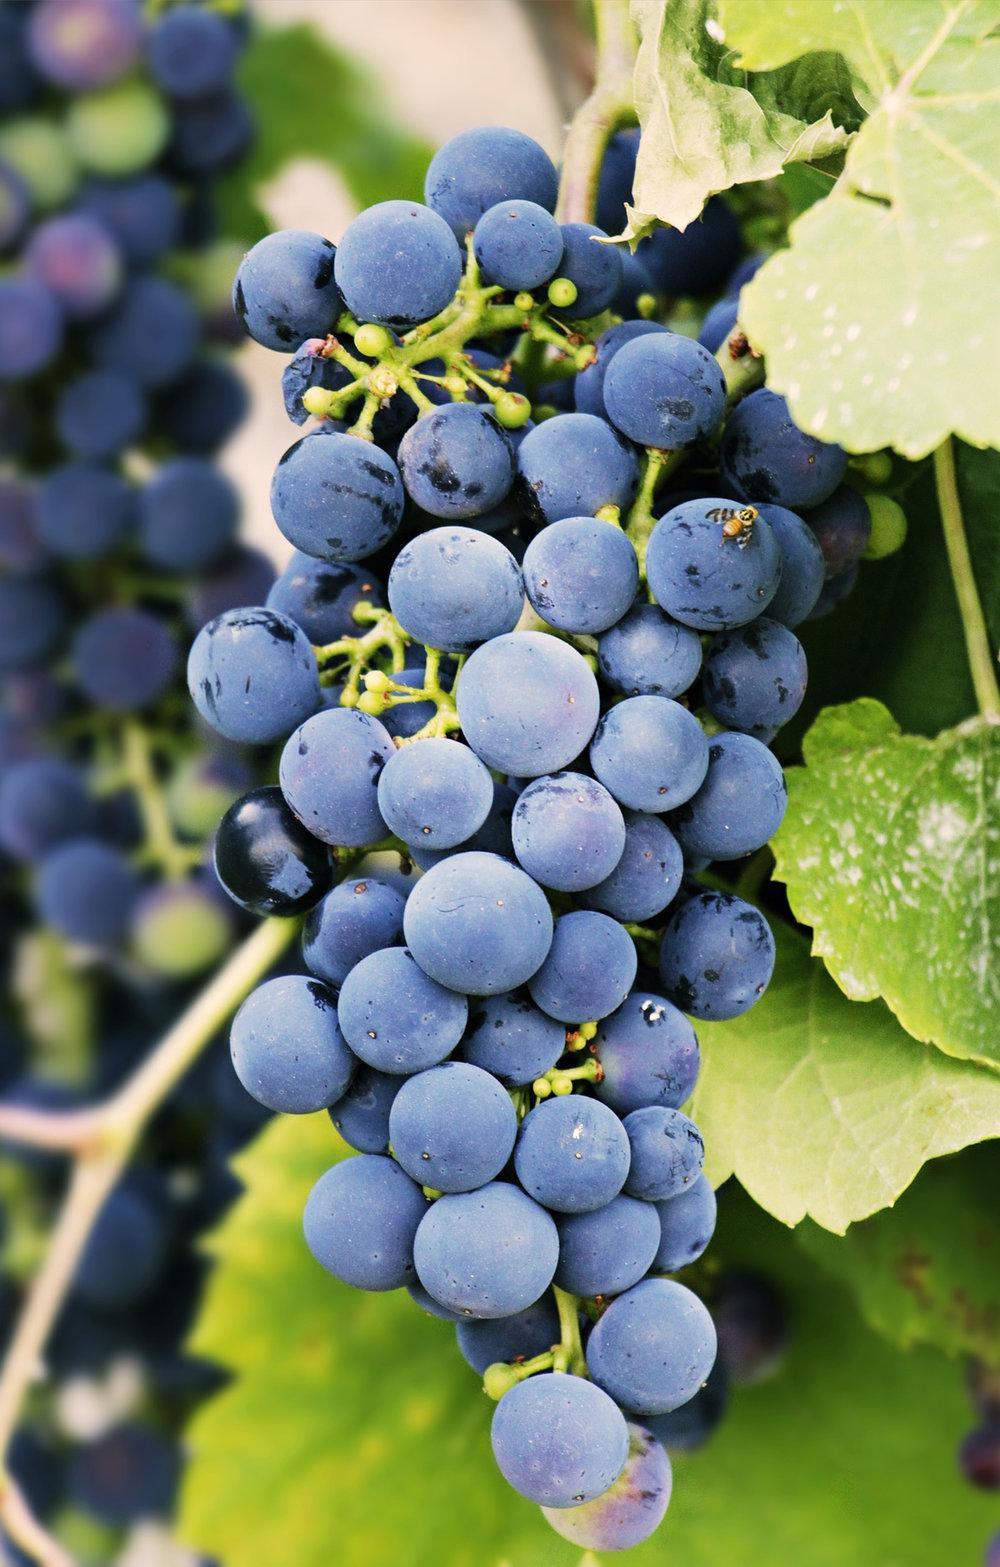 austin_wine.jpg